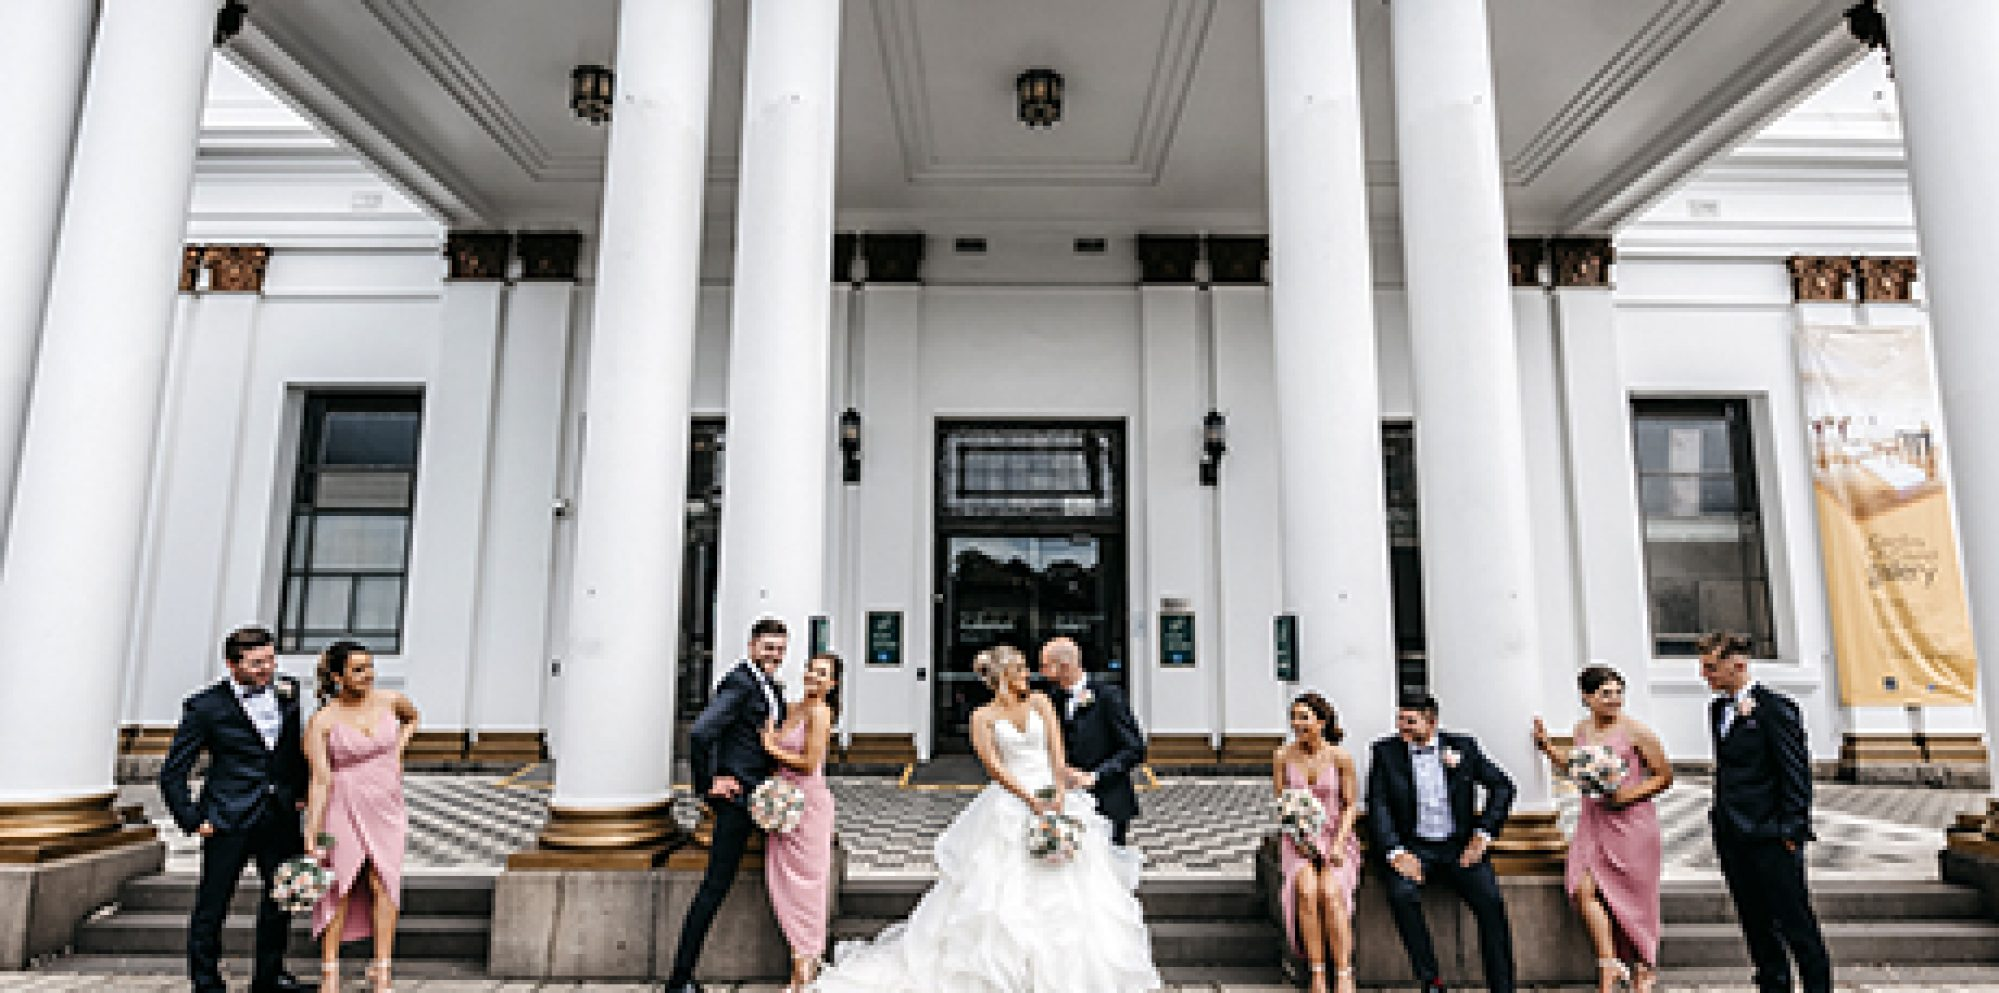 Katherine & tony | doyles bridge hotel wedding videography melbourne